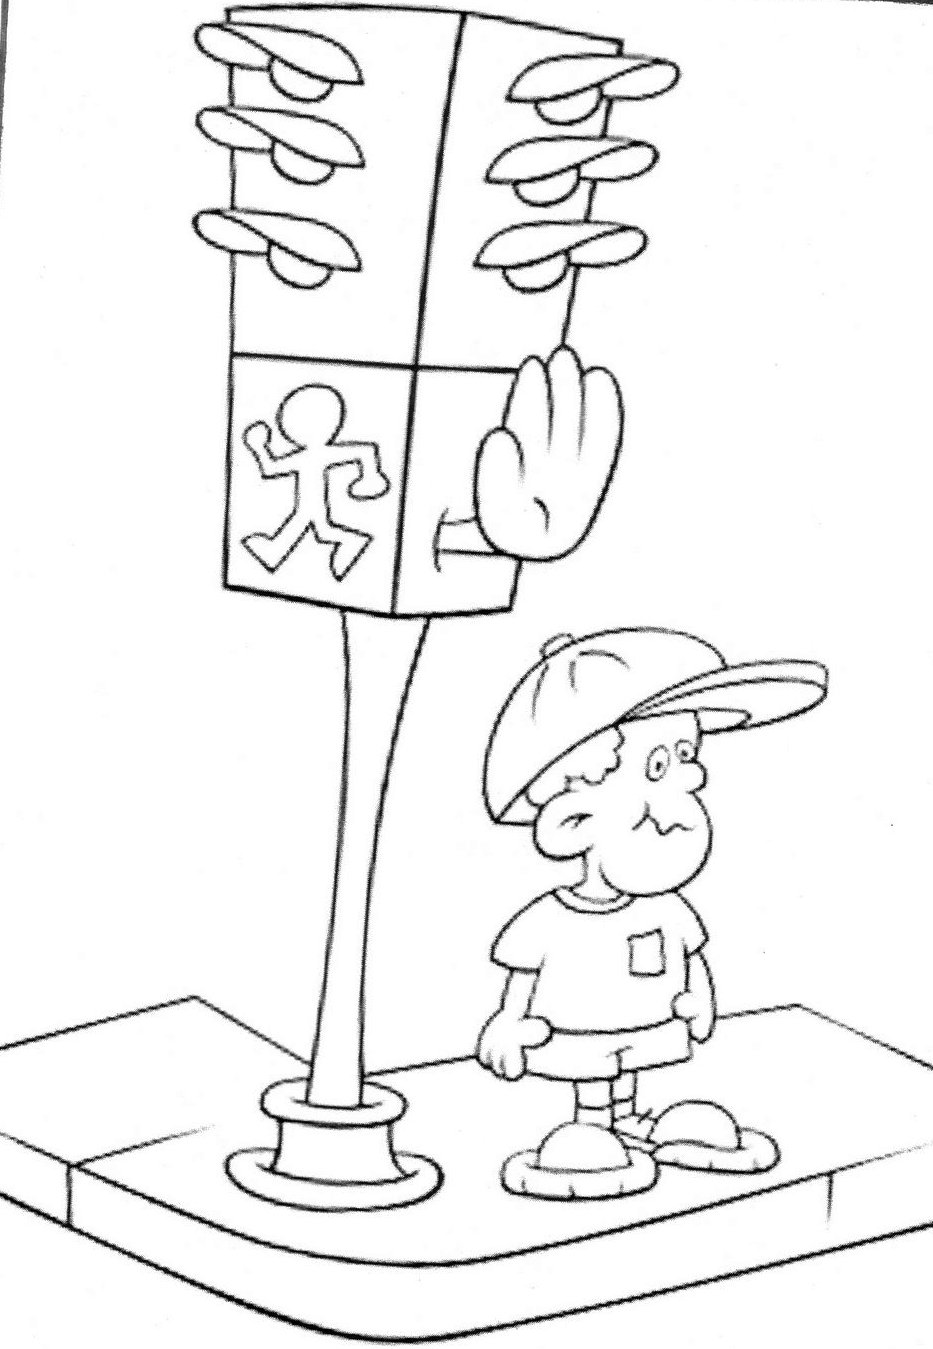 desenho de semáforo para colorir imagui